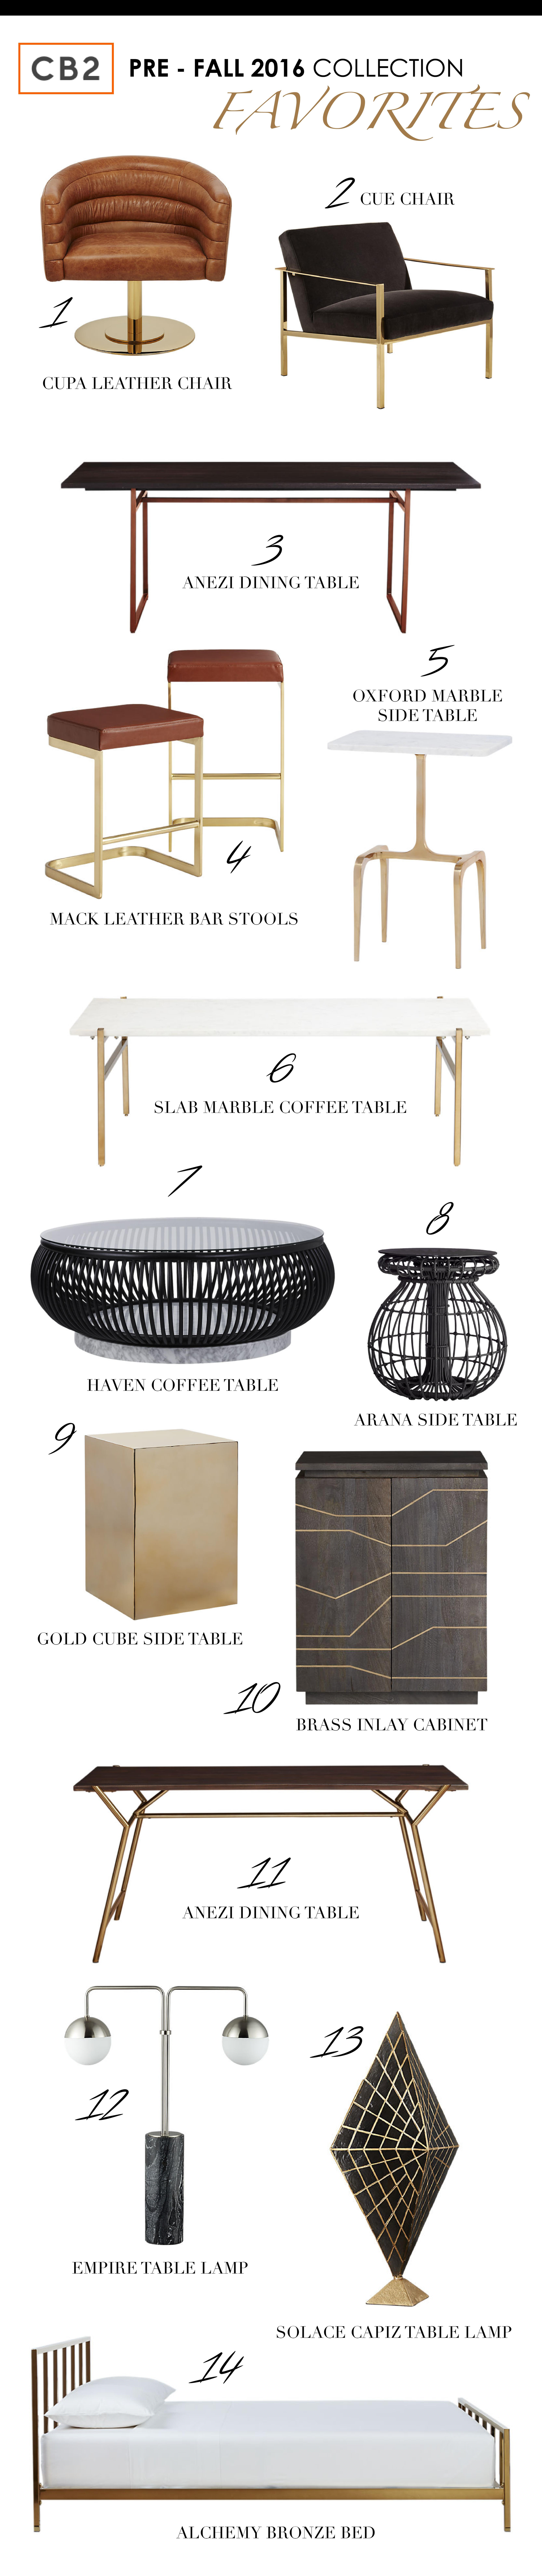 Surprising Favorite Furniture Finds Cb2S Pre Fall 2016 Collection Inzonedesignstudio Interior Chair Design Inzonedesignstudiocom